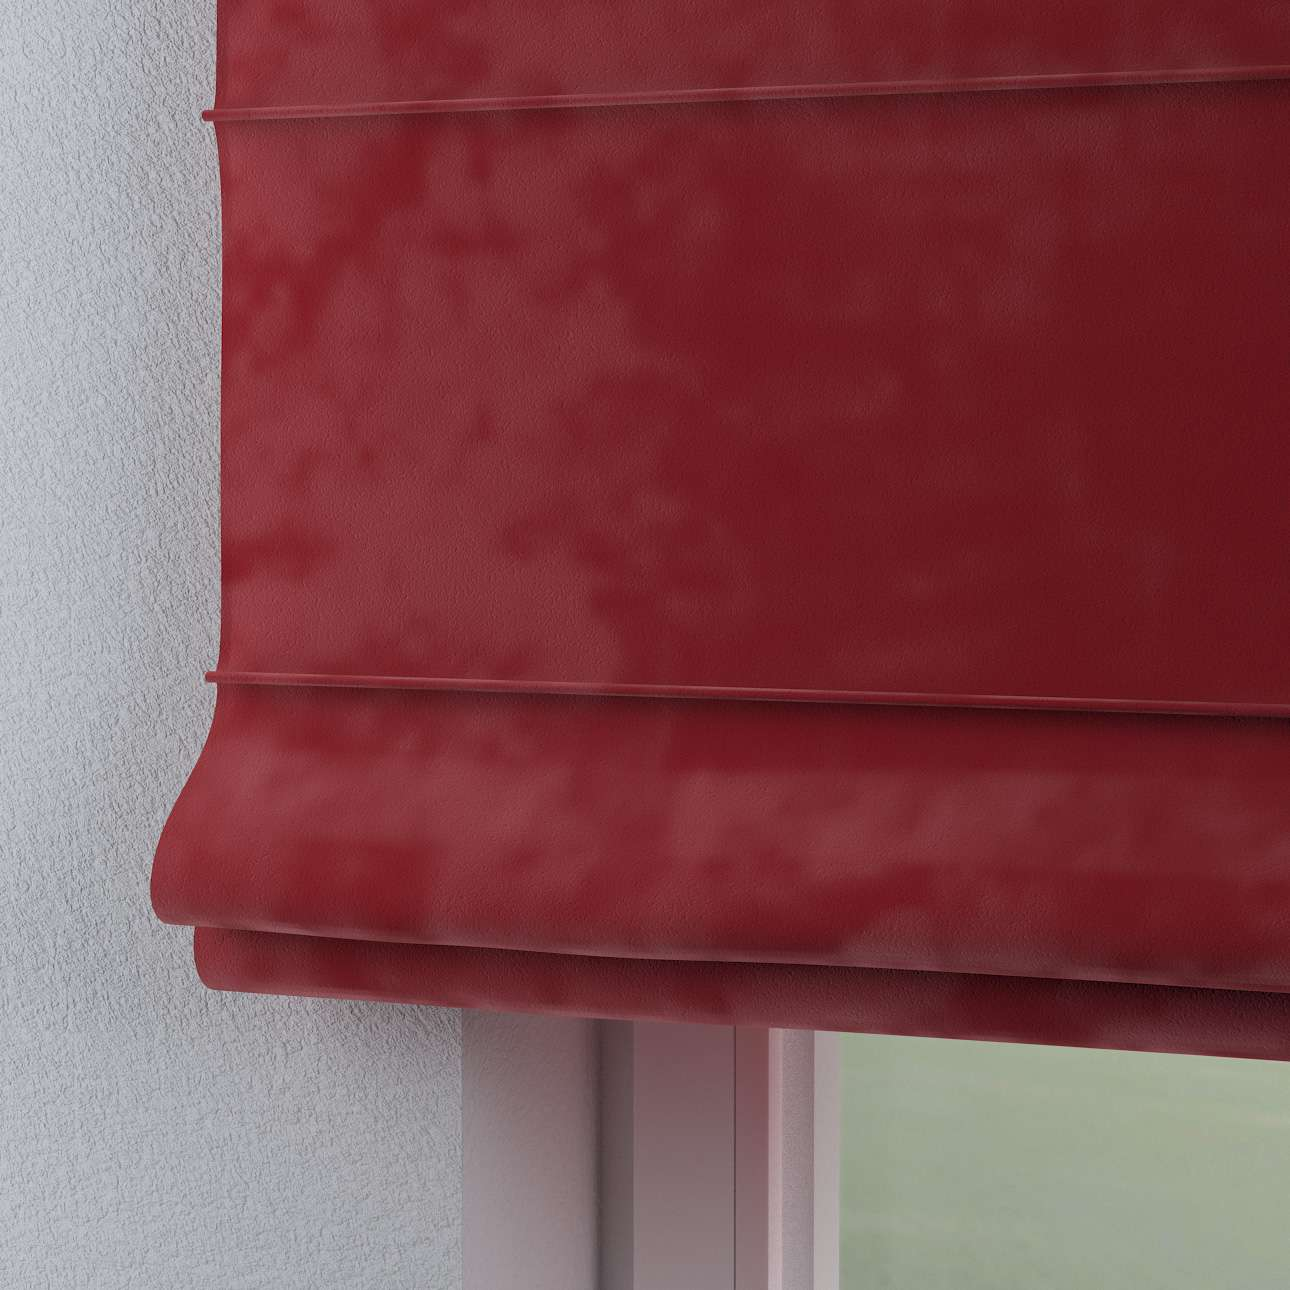 Rímska roleta Capri V kolekcii Velvet, tkanina: 704-15